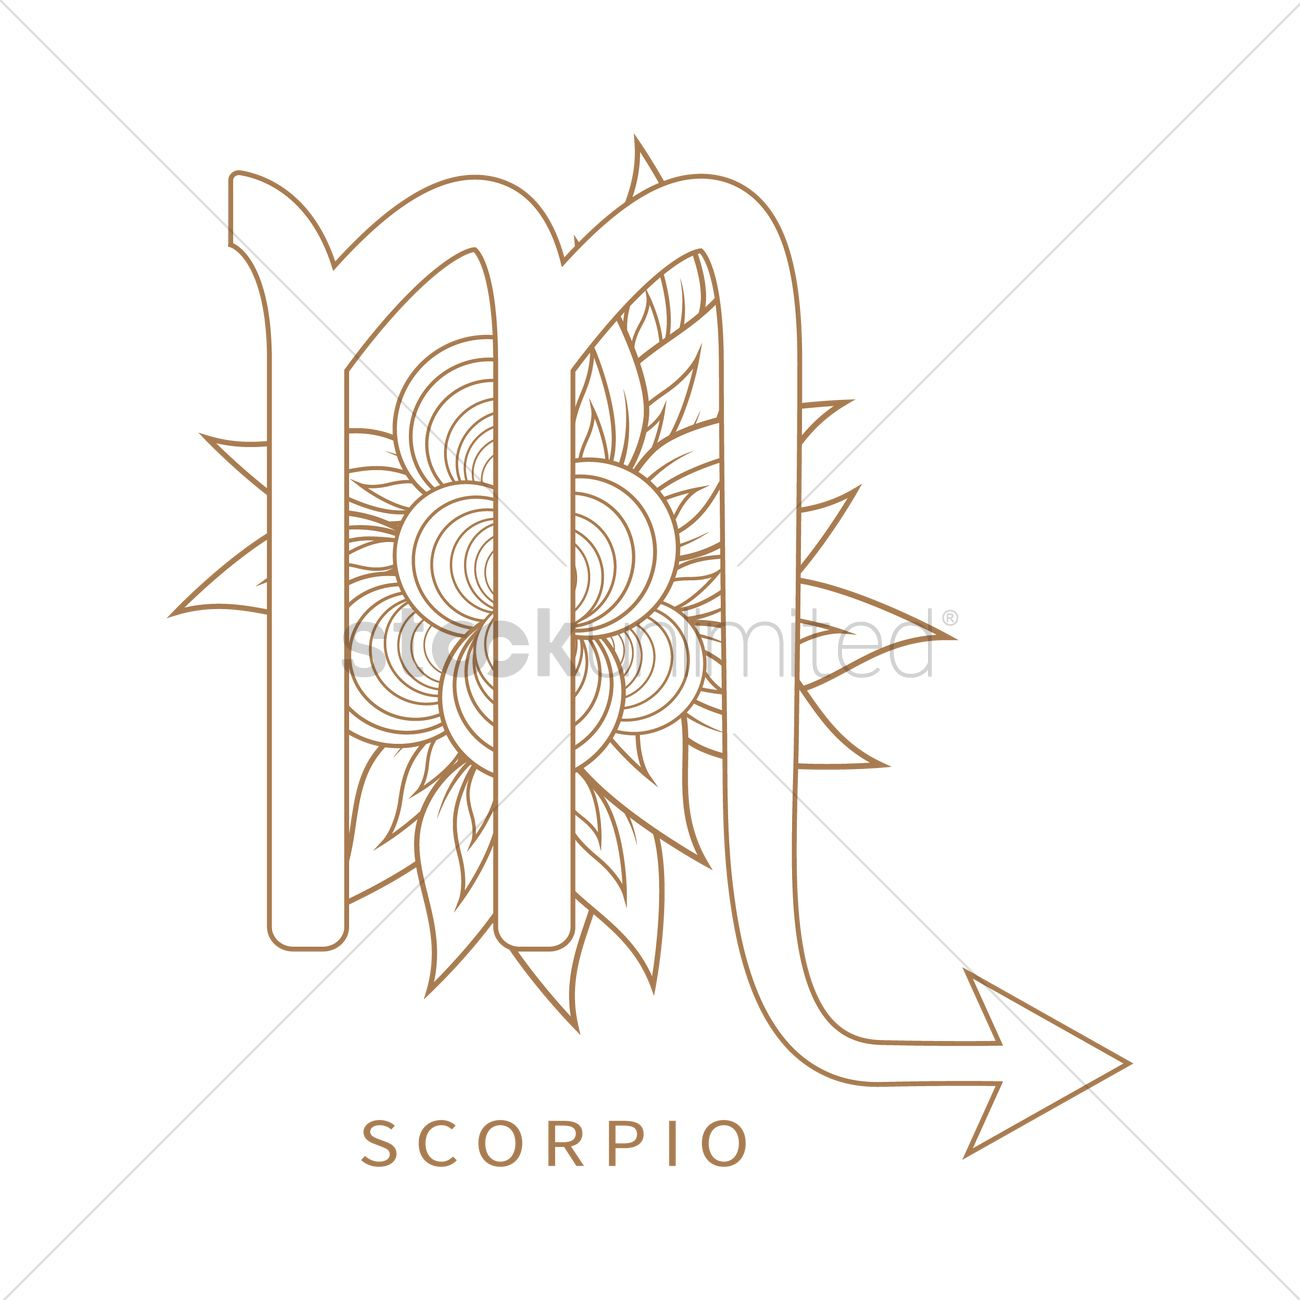 Scorpio Symbol Vector Image 1964279 Stockunlimited